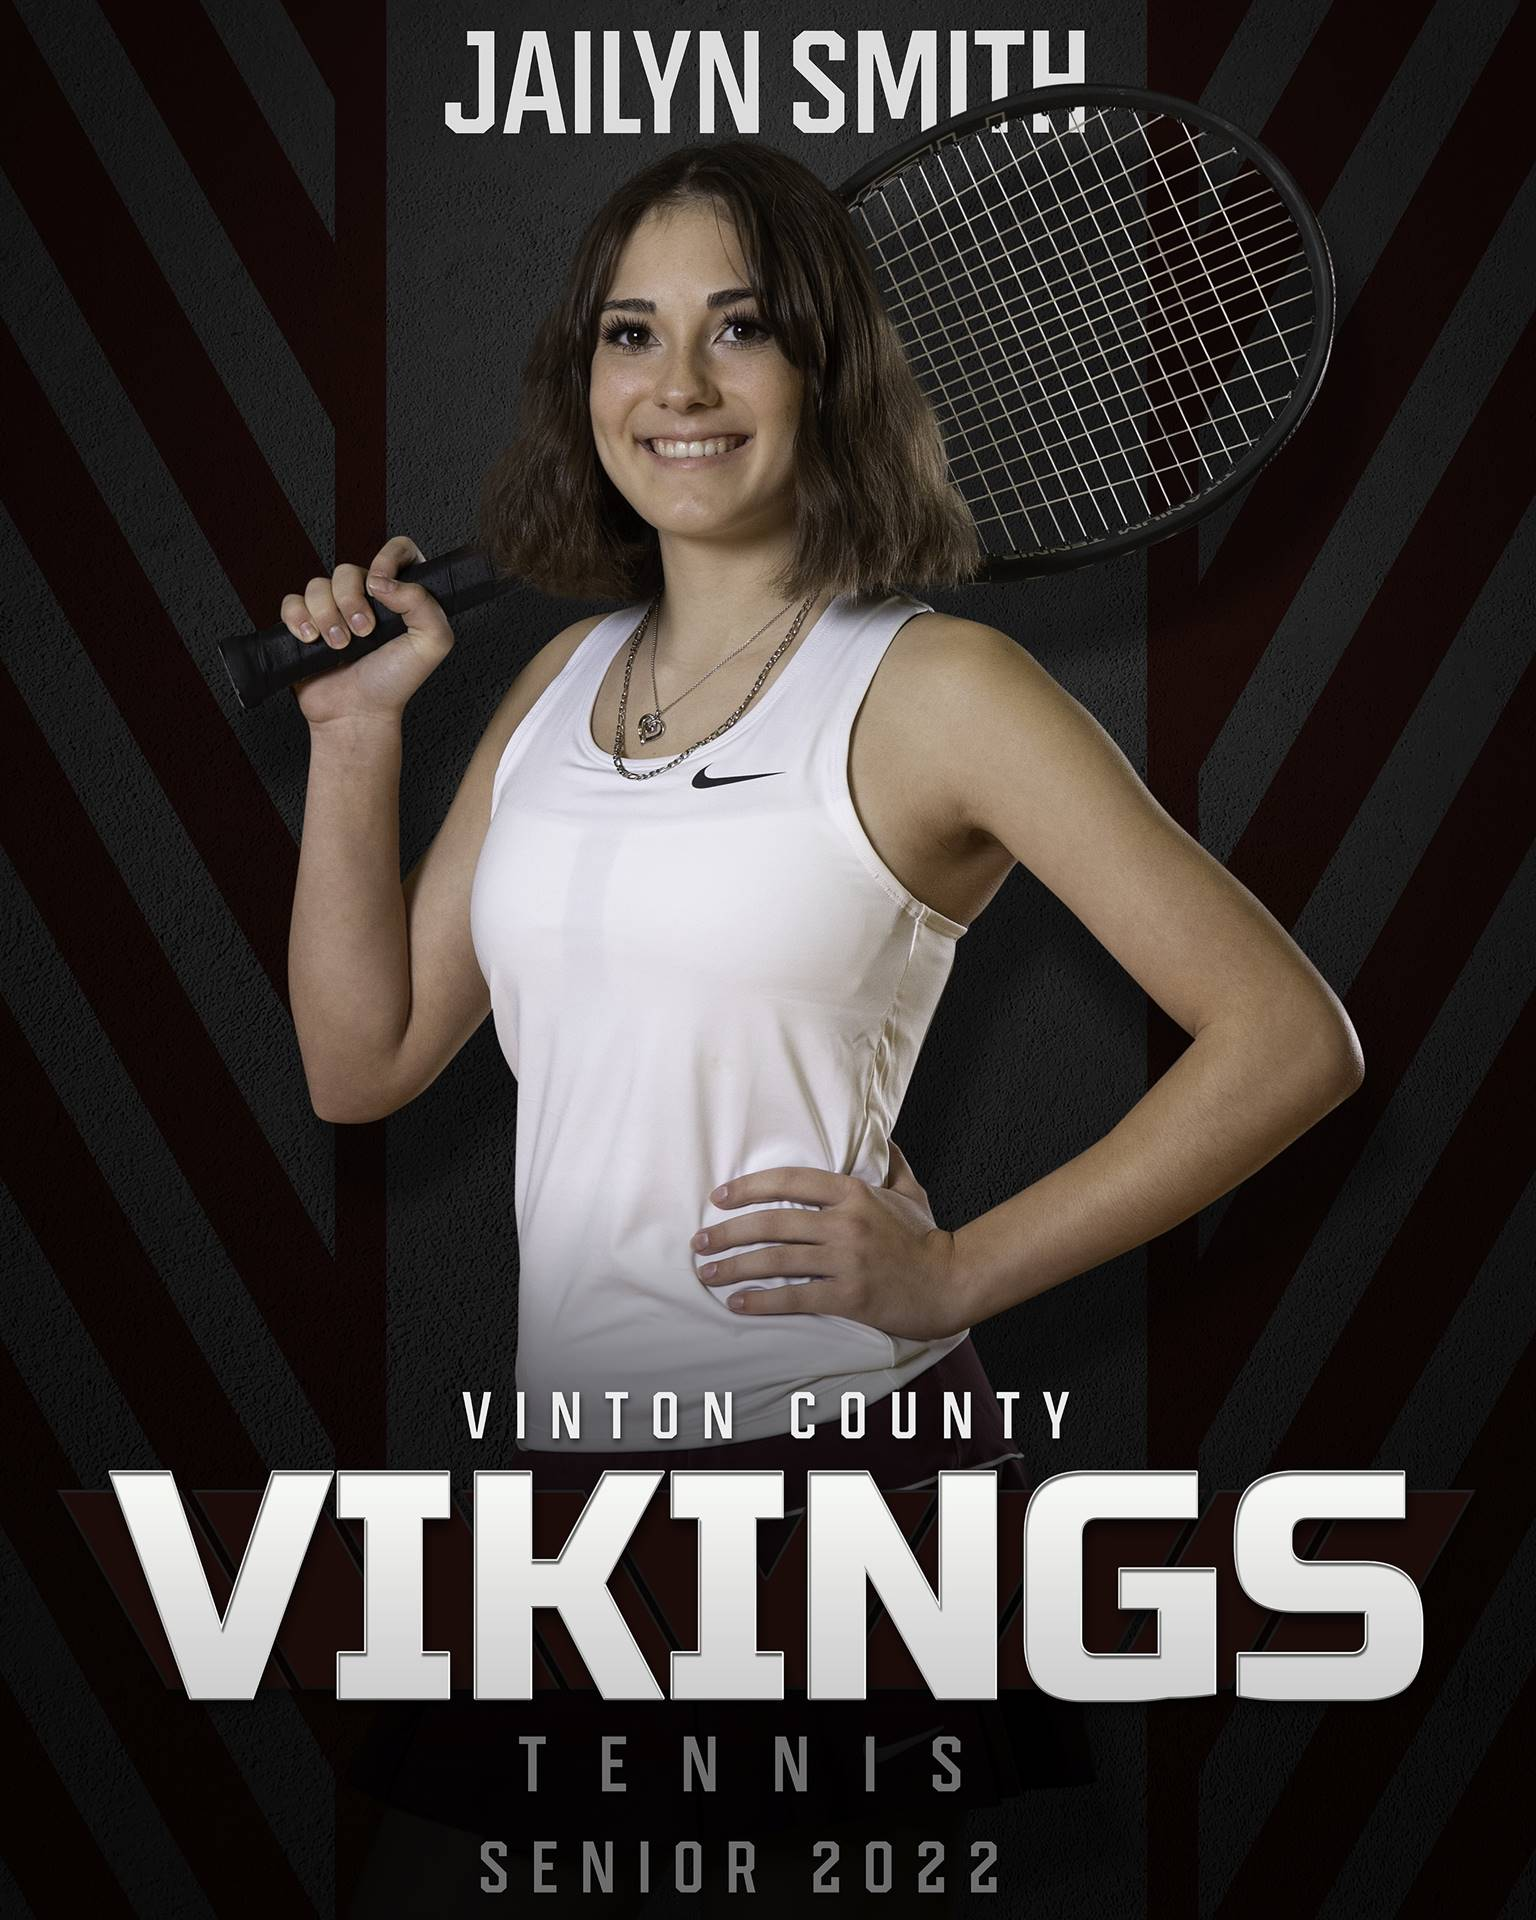 Jailyn Smith - Tennis